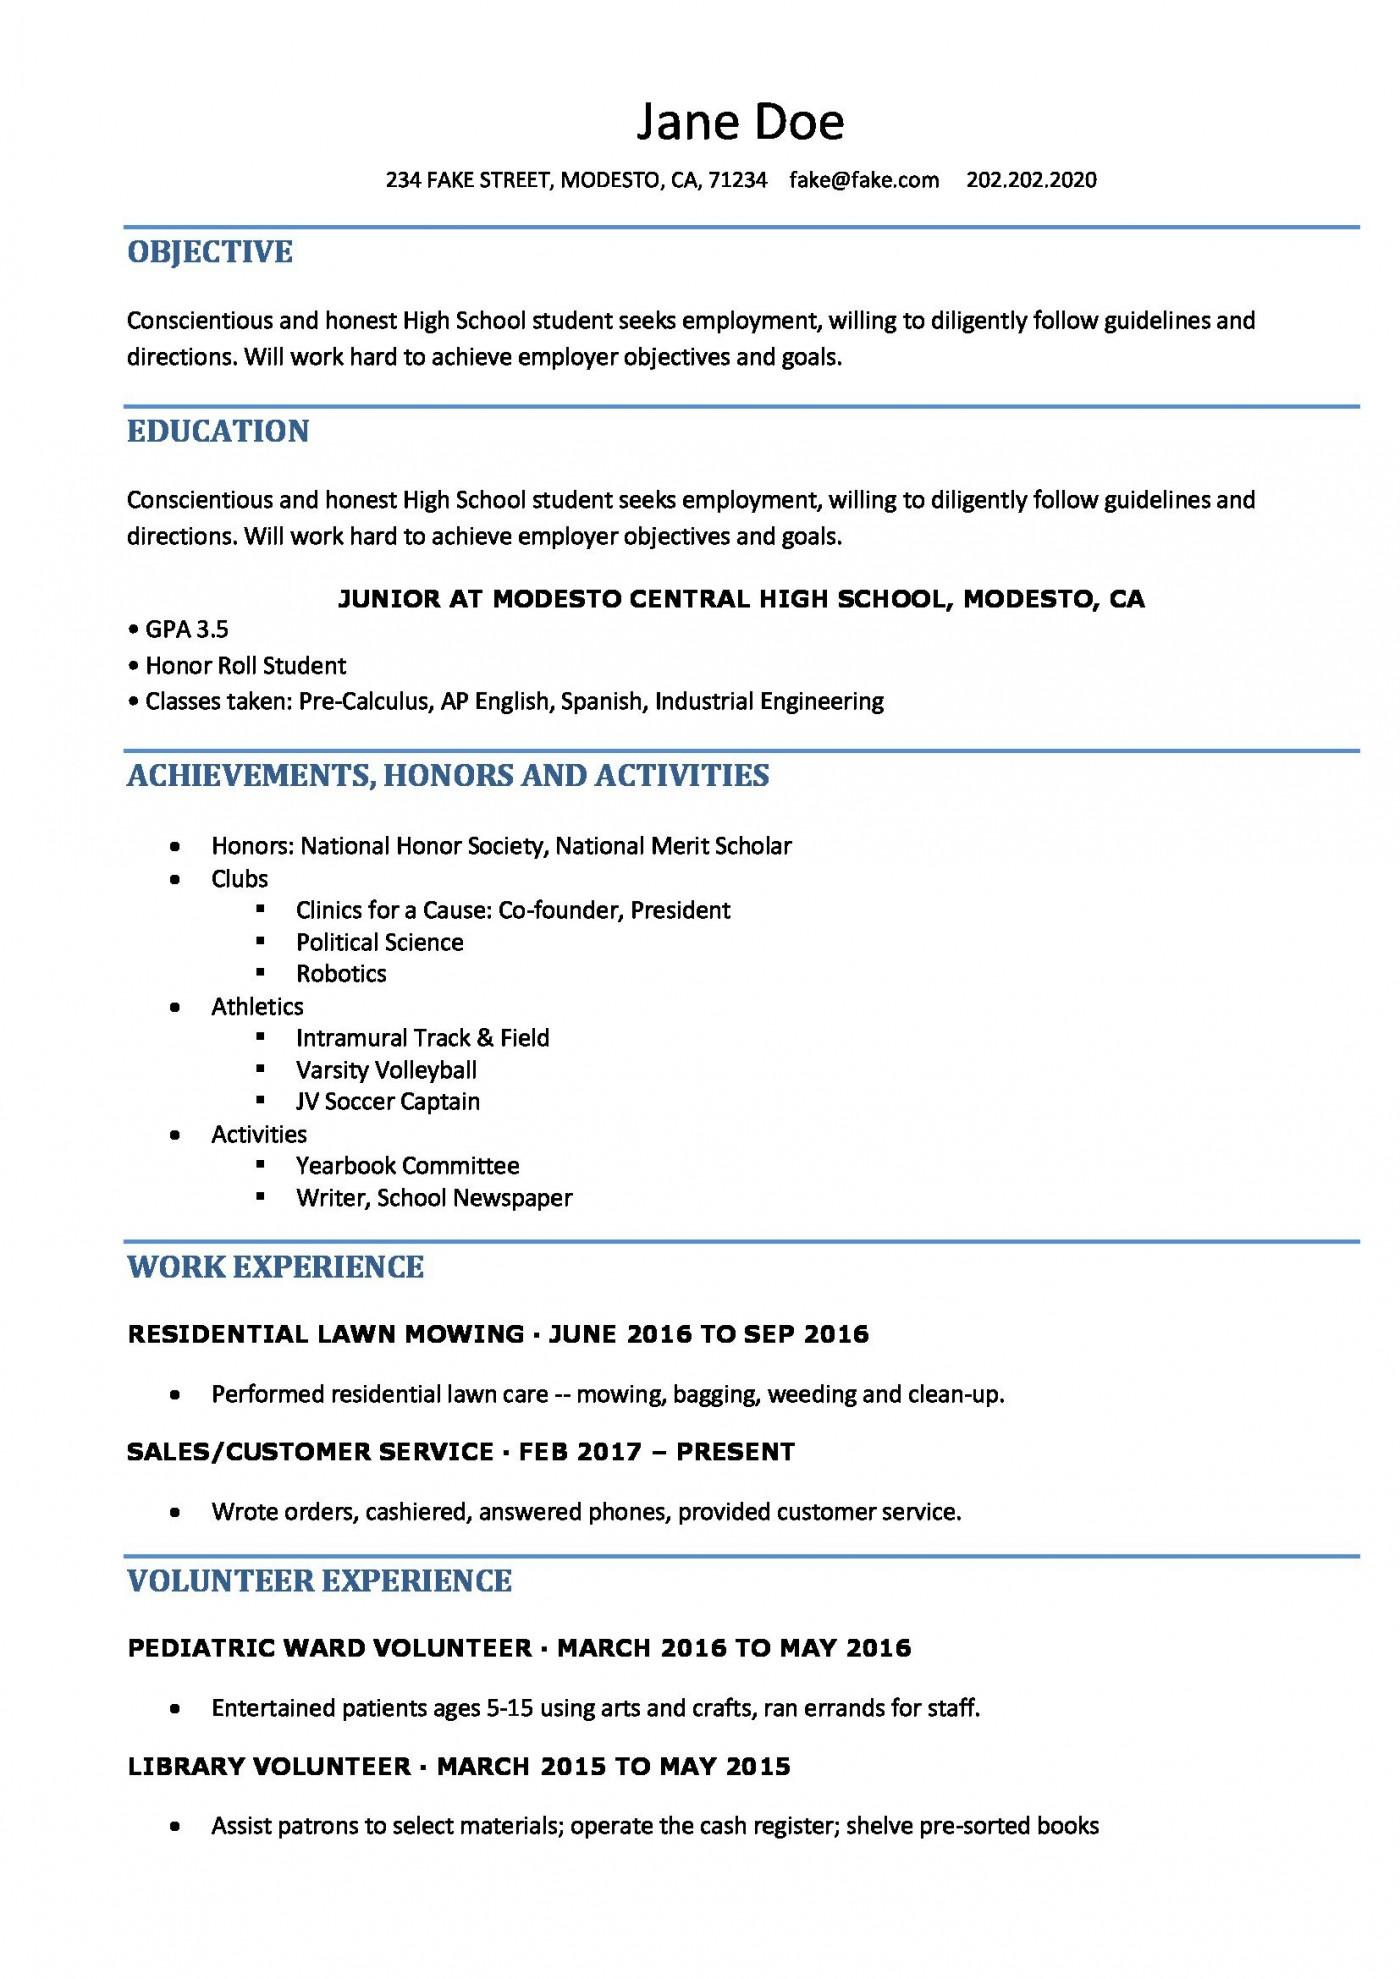 006 Singular Resume Template High School Student Idea  Sample First Job1400